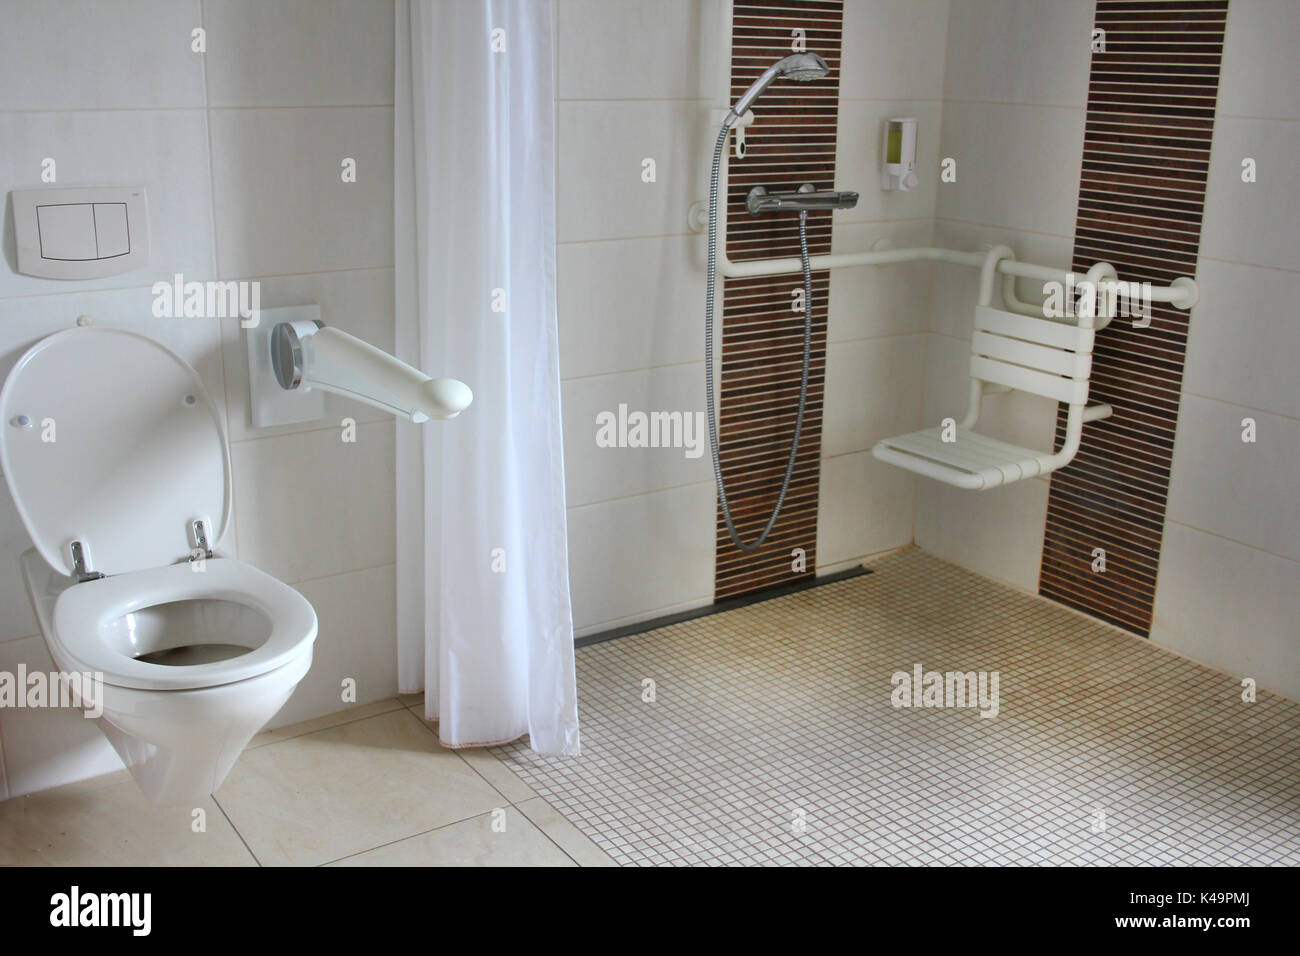 Behindertengerechtes Badezimmer.Behindertengerechtes Badezimmer Stockfotos